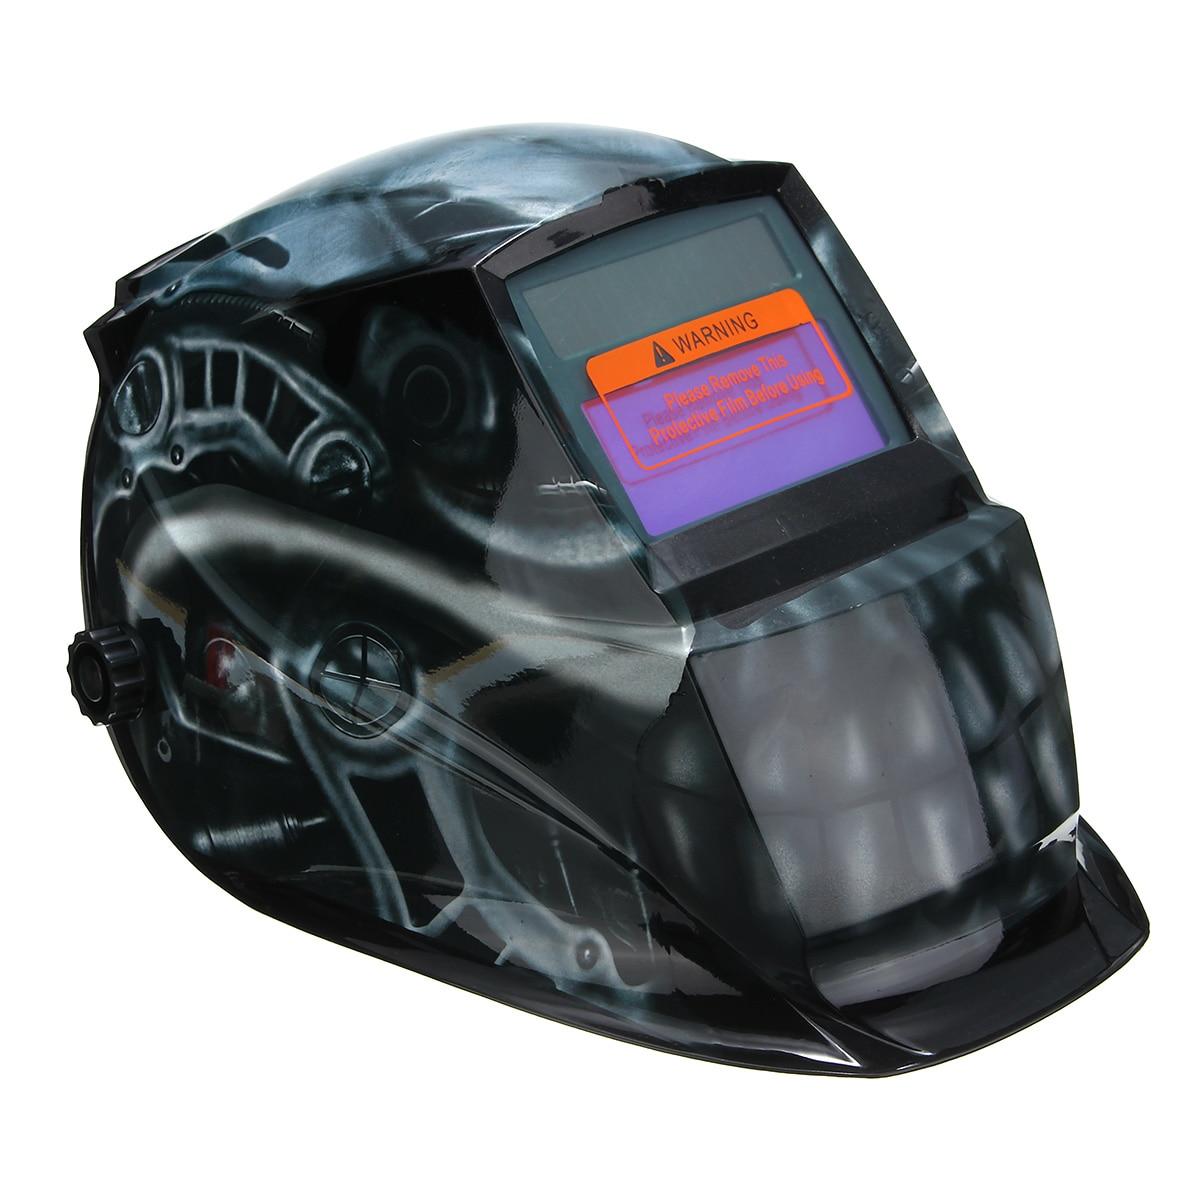 Best Price Solar Auto Darkening Welders Welding Helmet Head Shield Grinding Full Face Coverage Welding Helmets|Welding Helmets| |  - title=